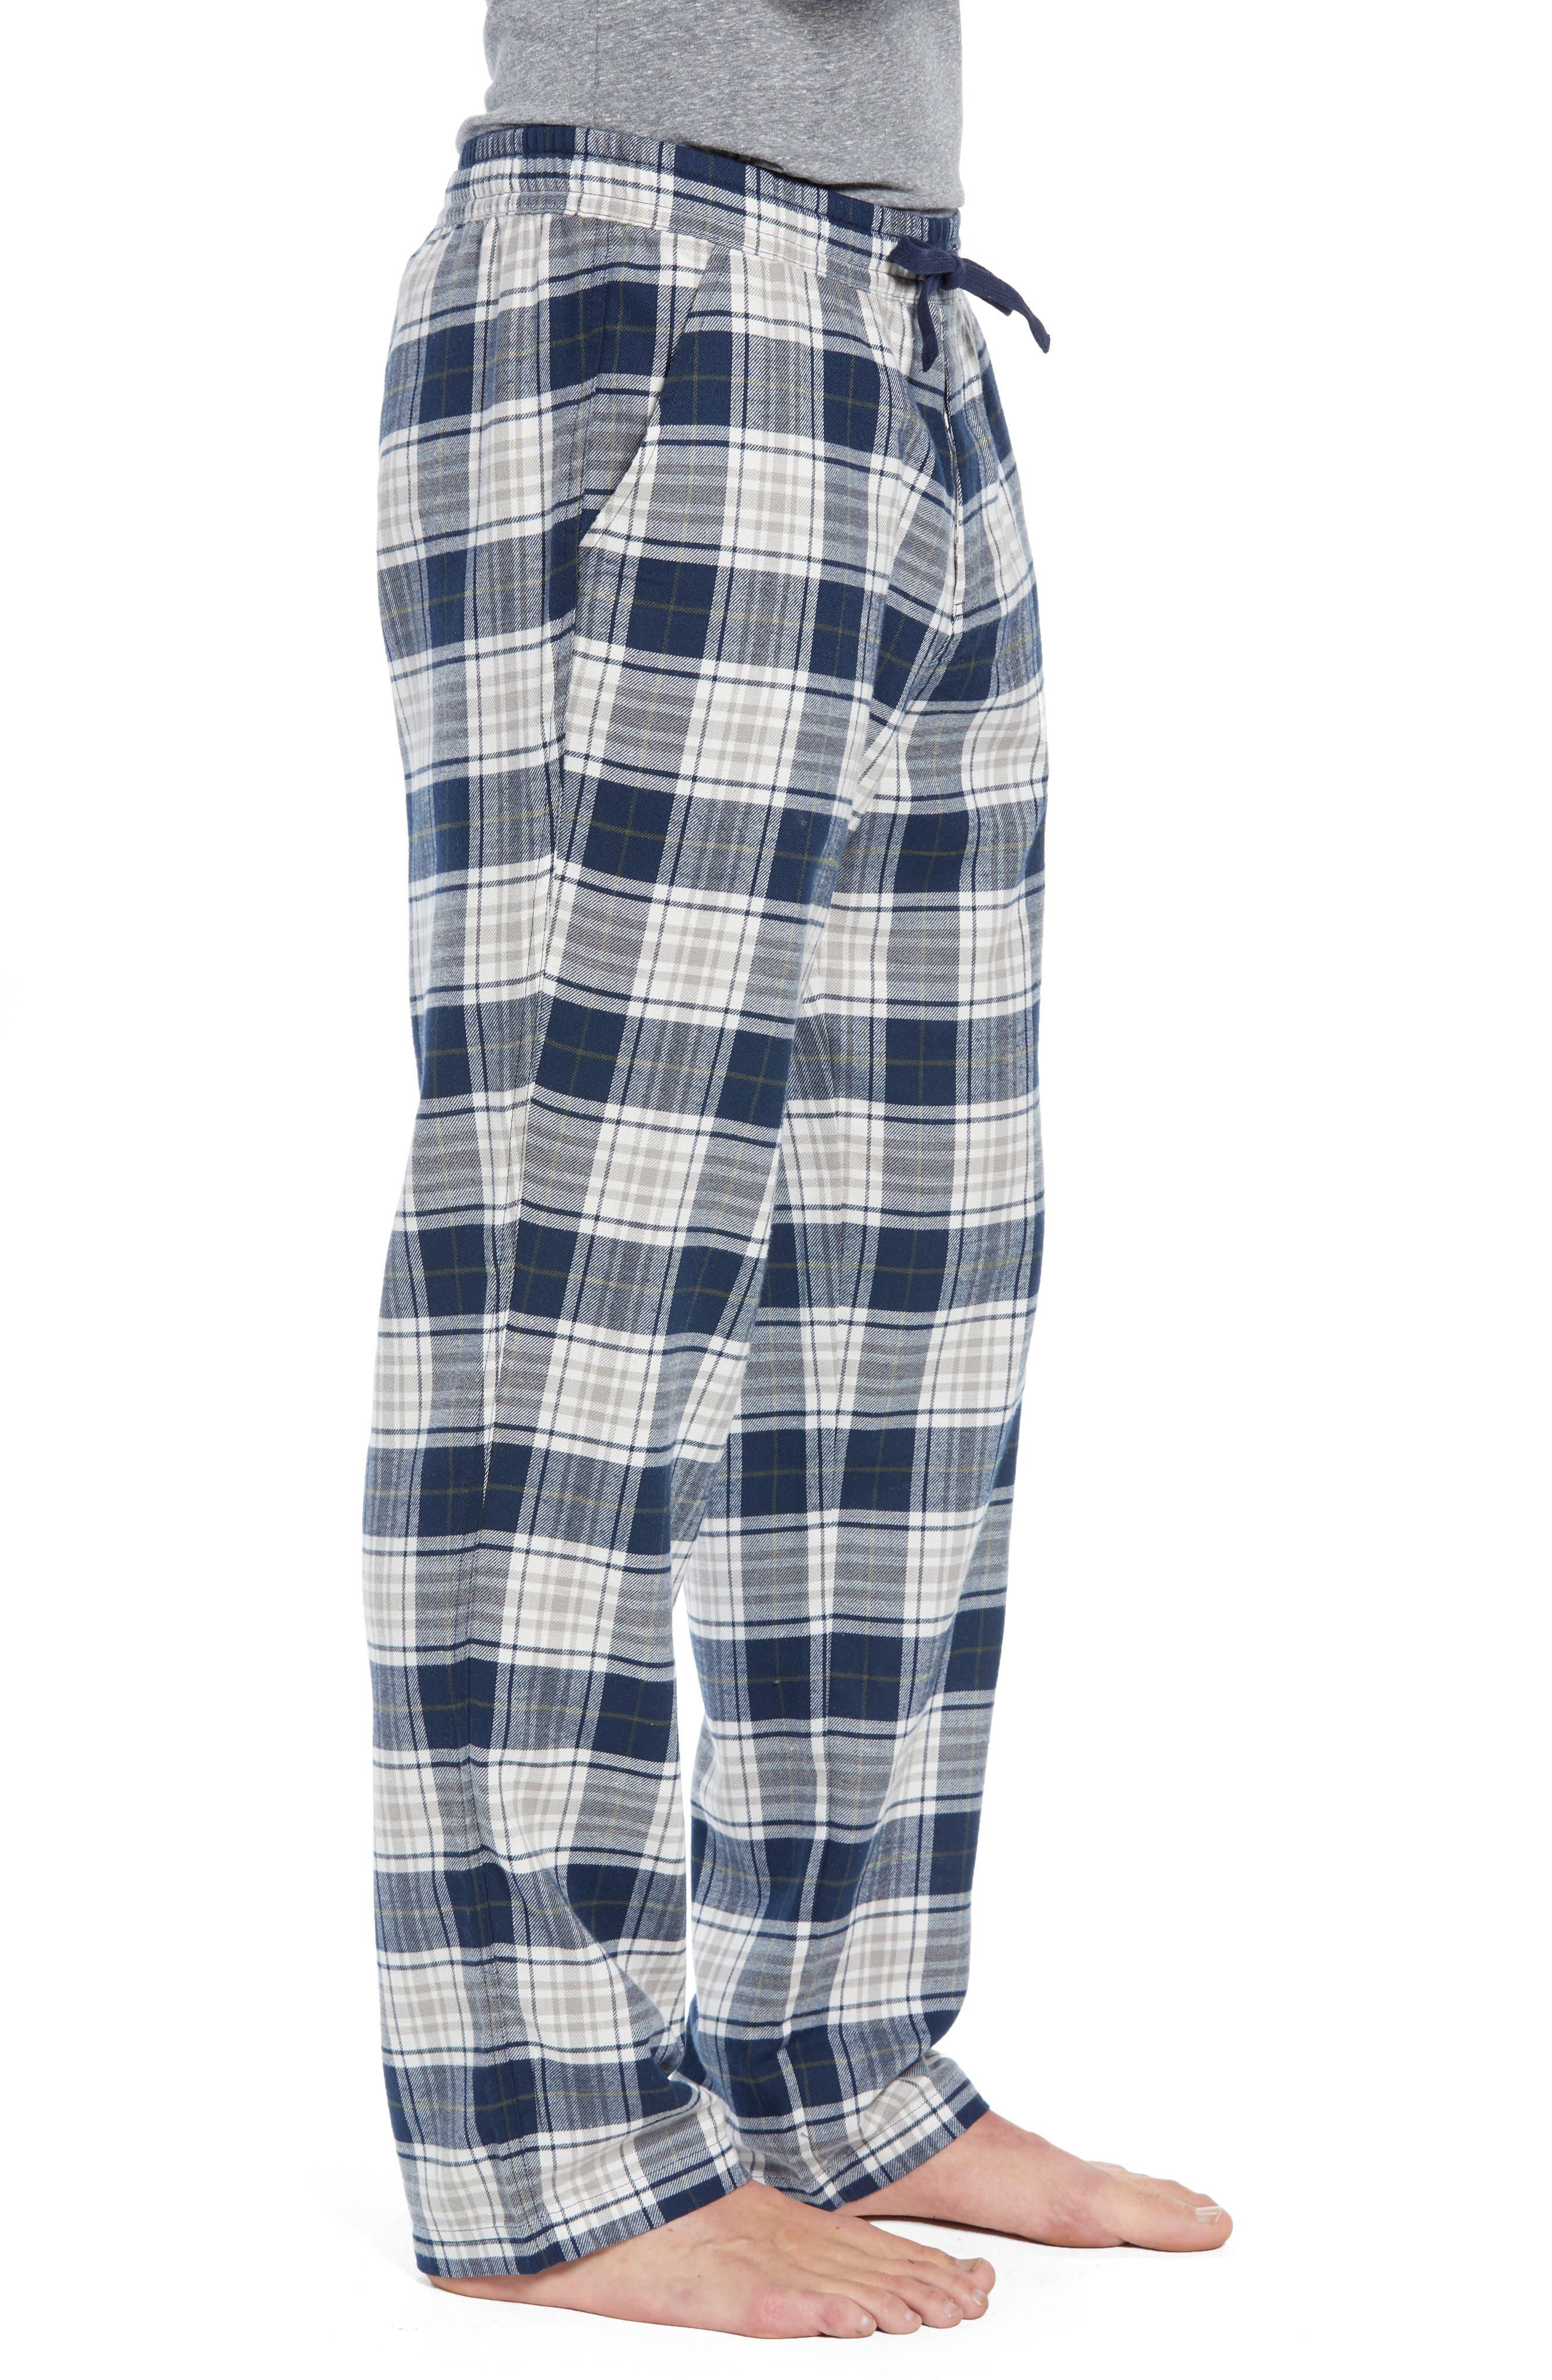 Steiner Pajama Set,                             Alternate thumbnail 3, color,                             NAVY/ GREY HEATHER